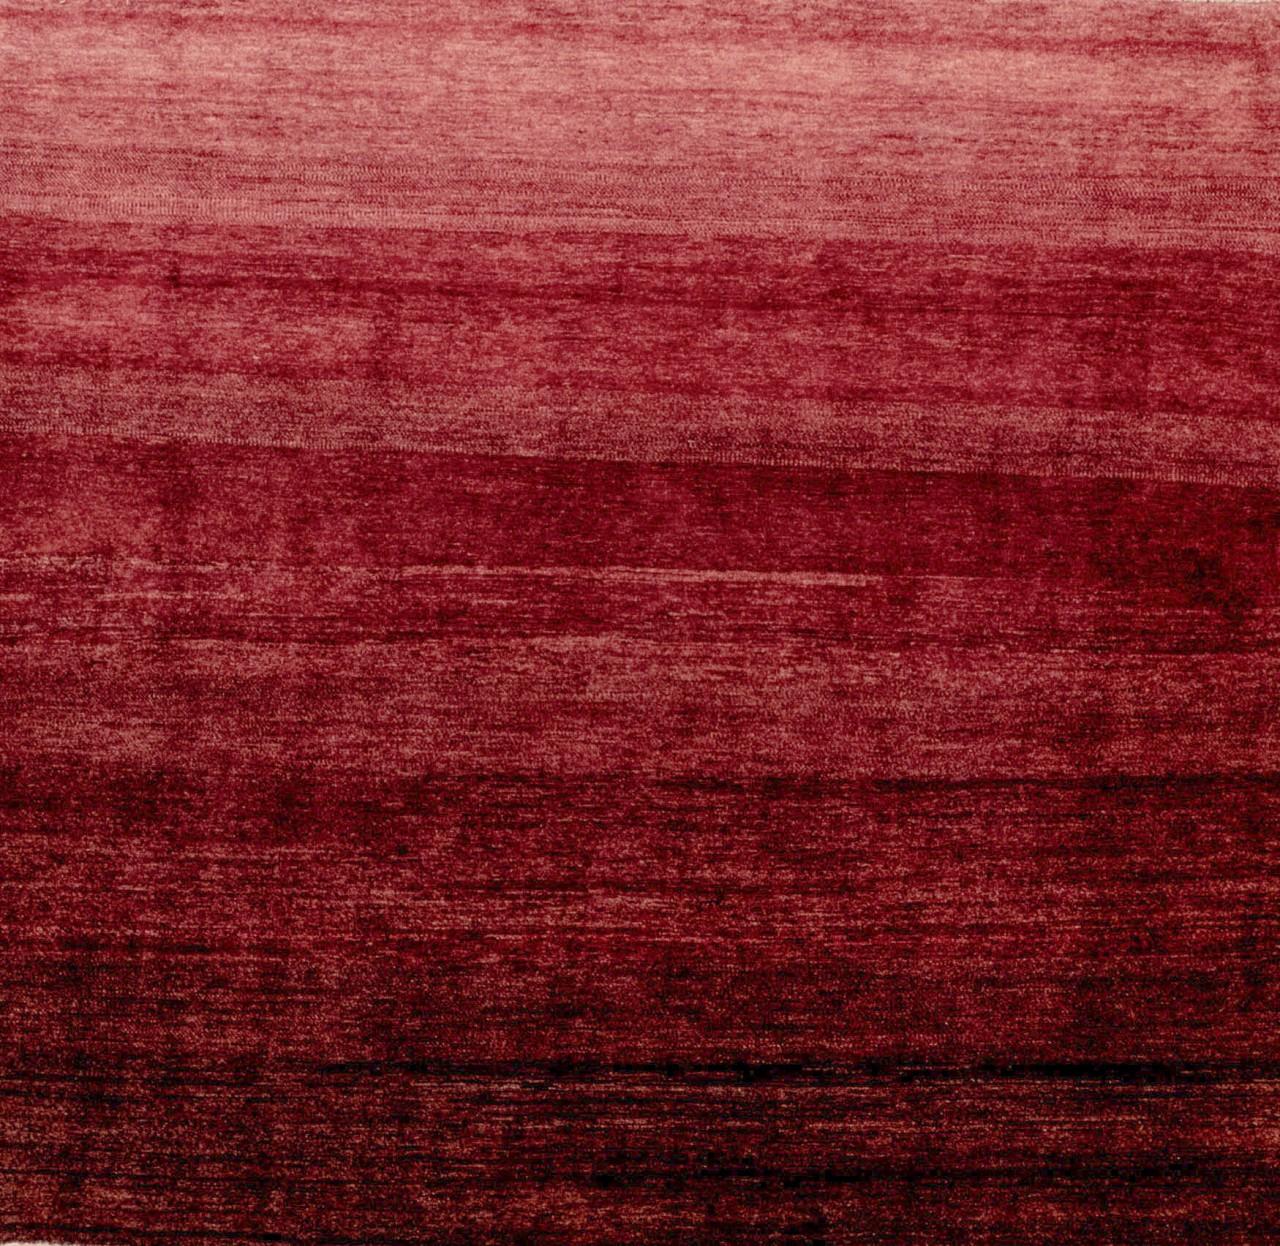 Gabbeh-Teppich Redflow